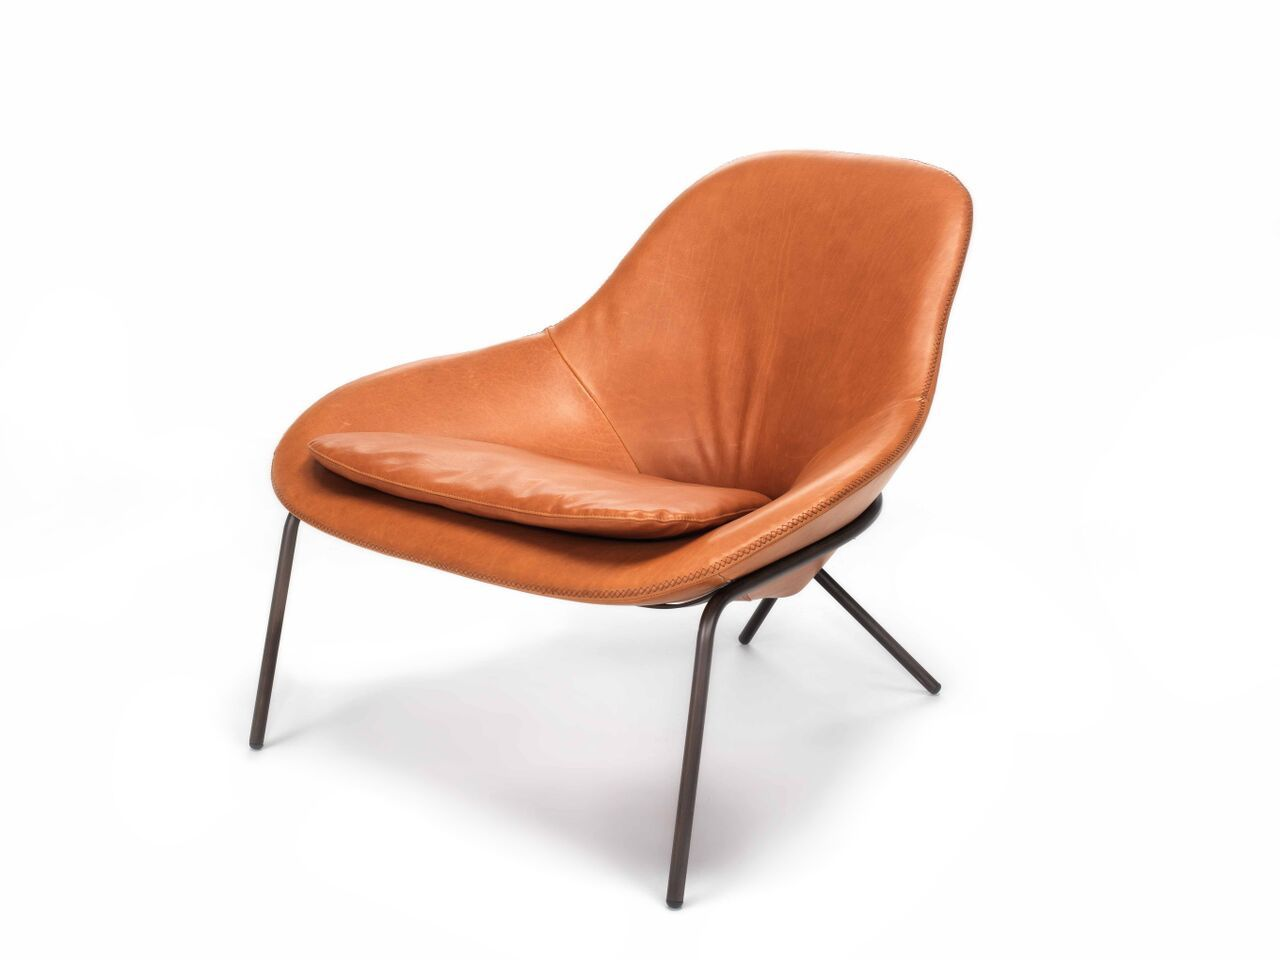 Comfortable Leather Lounge Chair Cross Leg Chair By Magnus Long Leather Lounge Chair Leather Lounge Leather Chaise Lounge